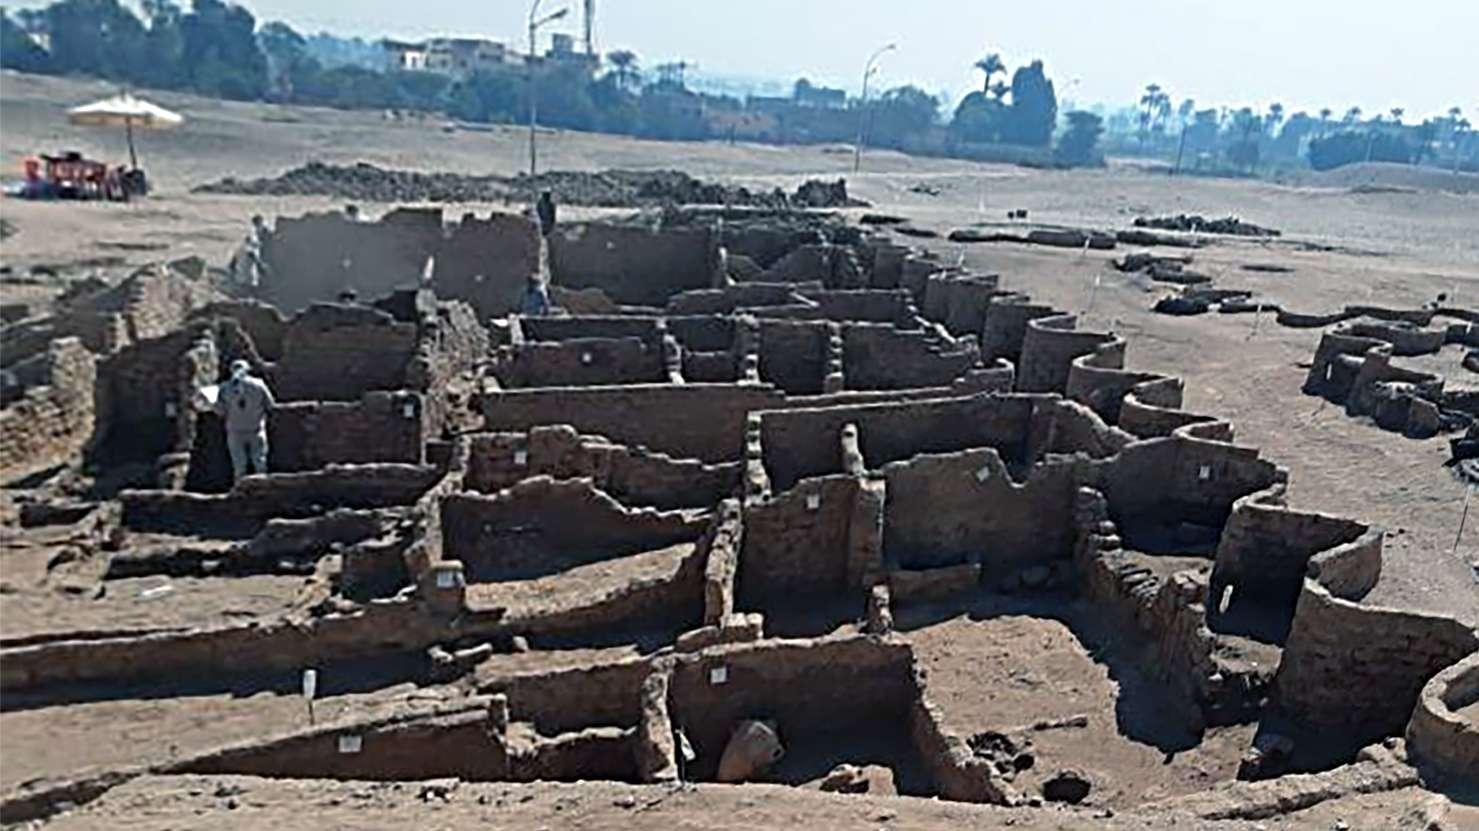 Λούξορ Luxor Λούξορ-Luxor-egypt-lost-city 1